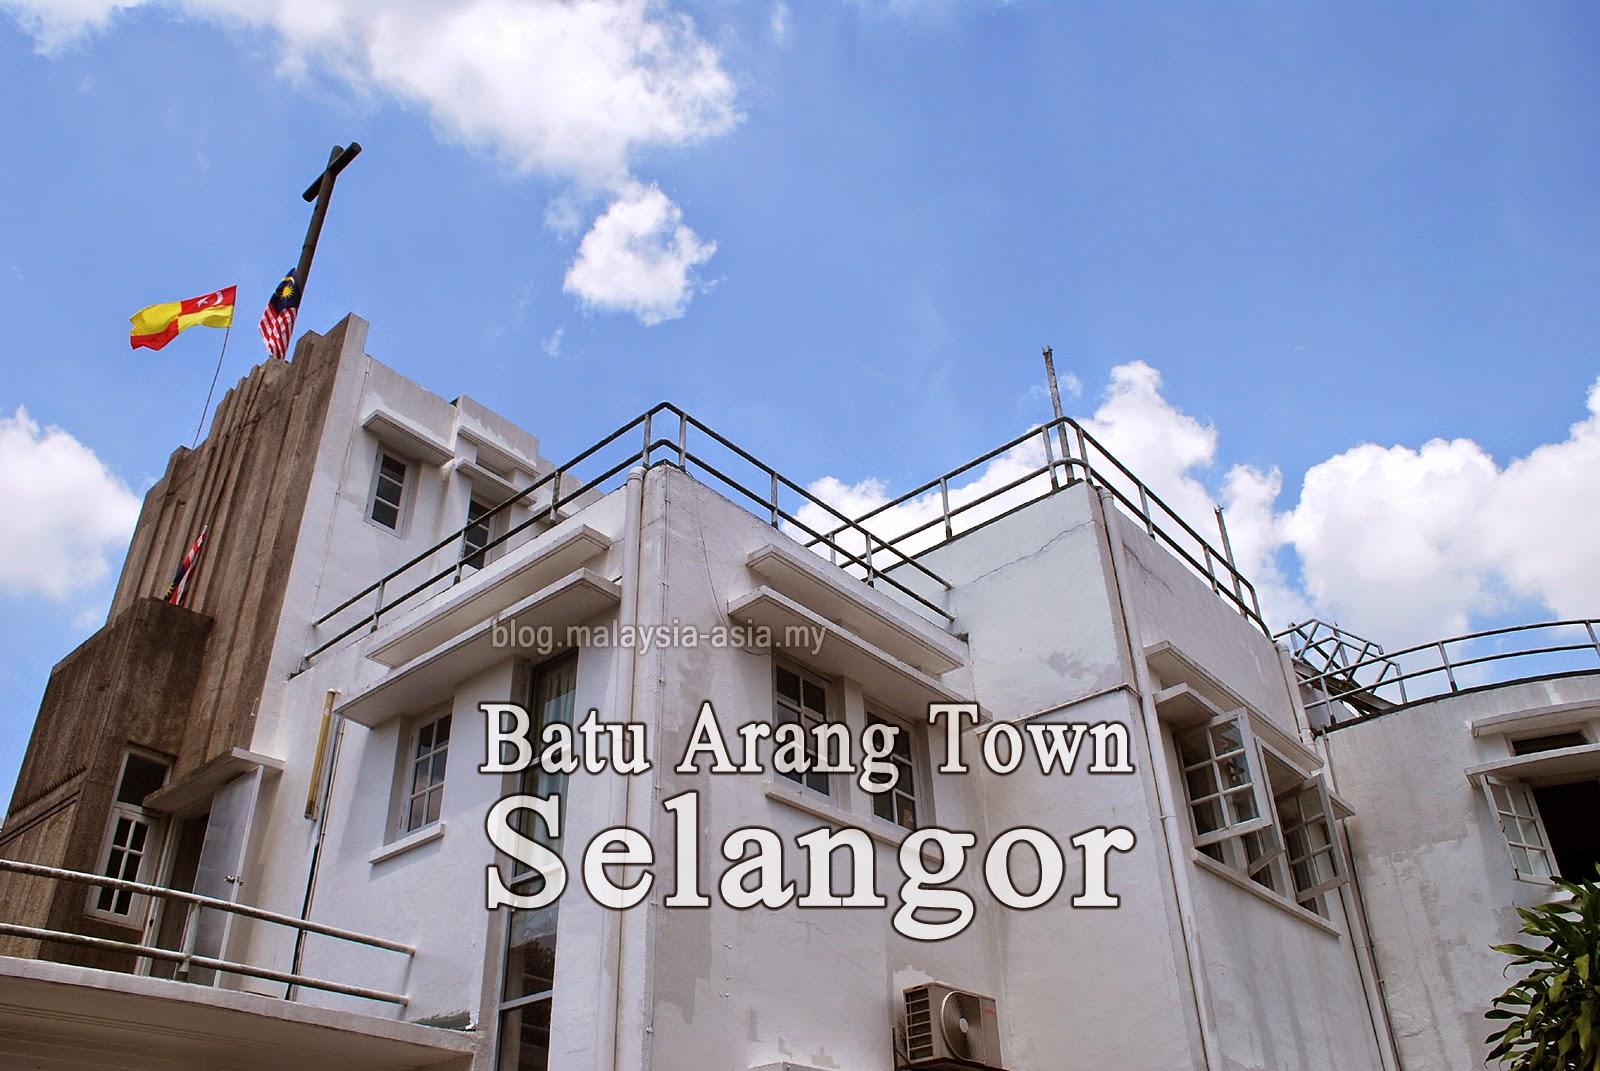 Selangor Batu Arang Town